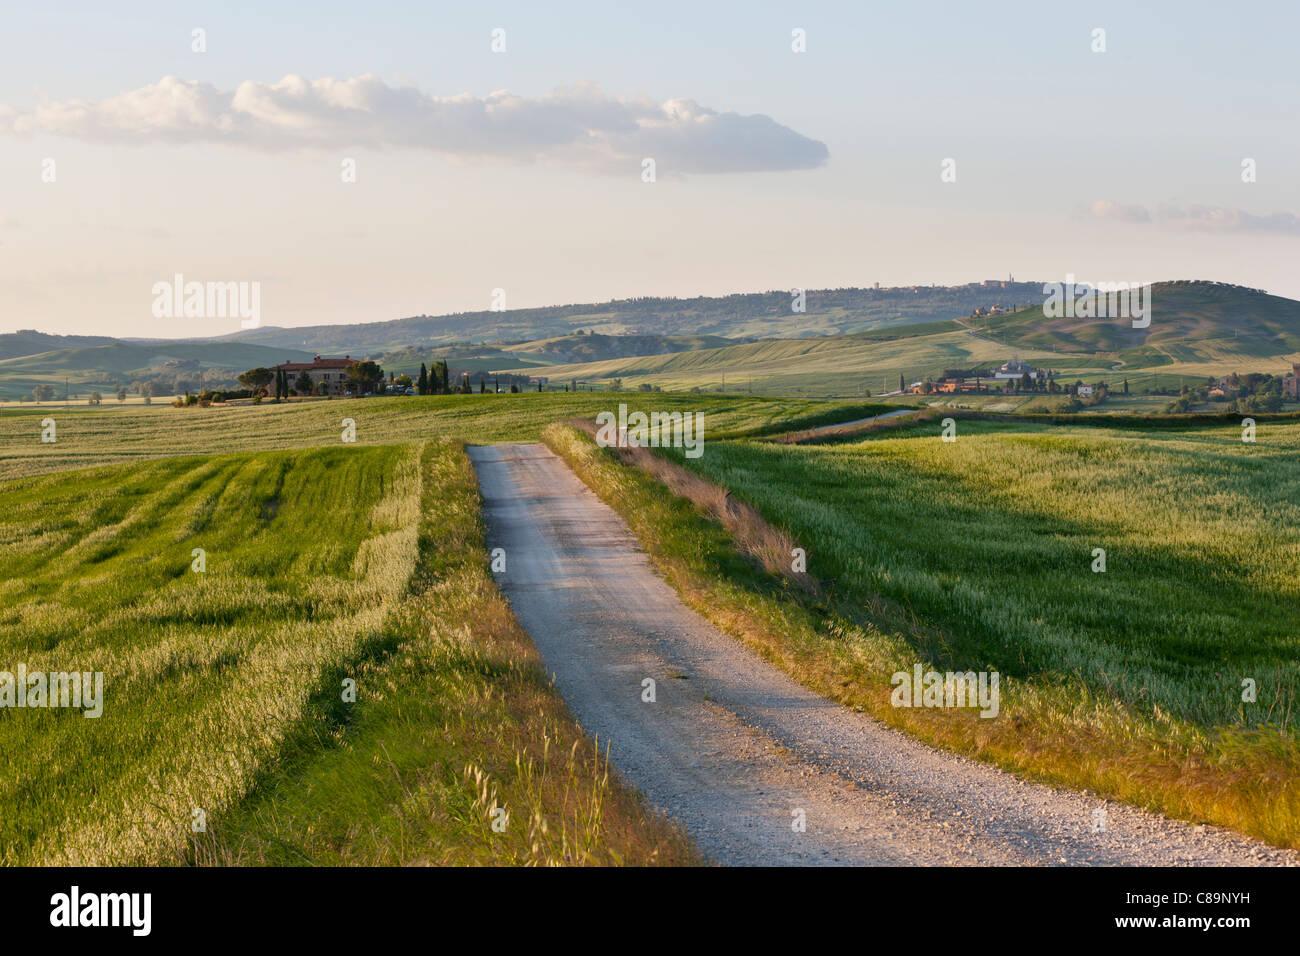 Italia, Toscana, Creta, Val d'Orcia, vista del camino hacia la granja Imagen De Stock